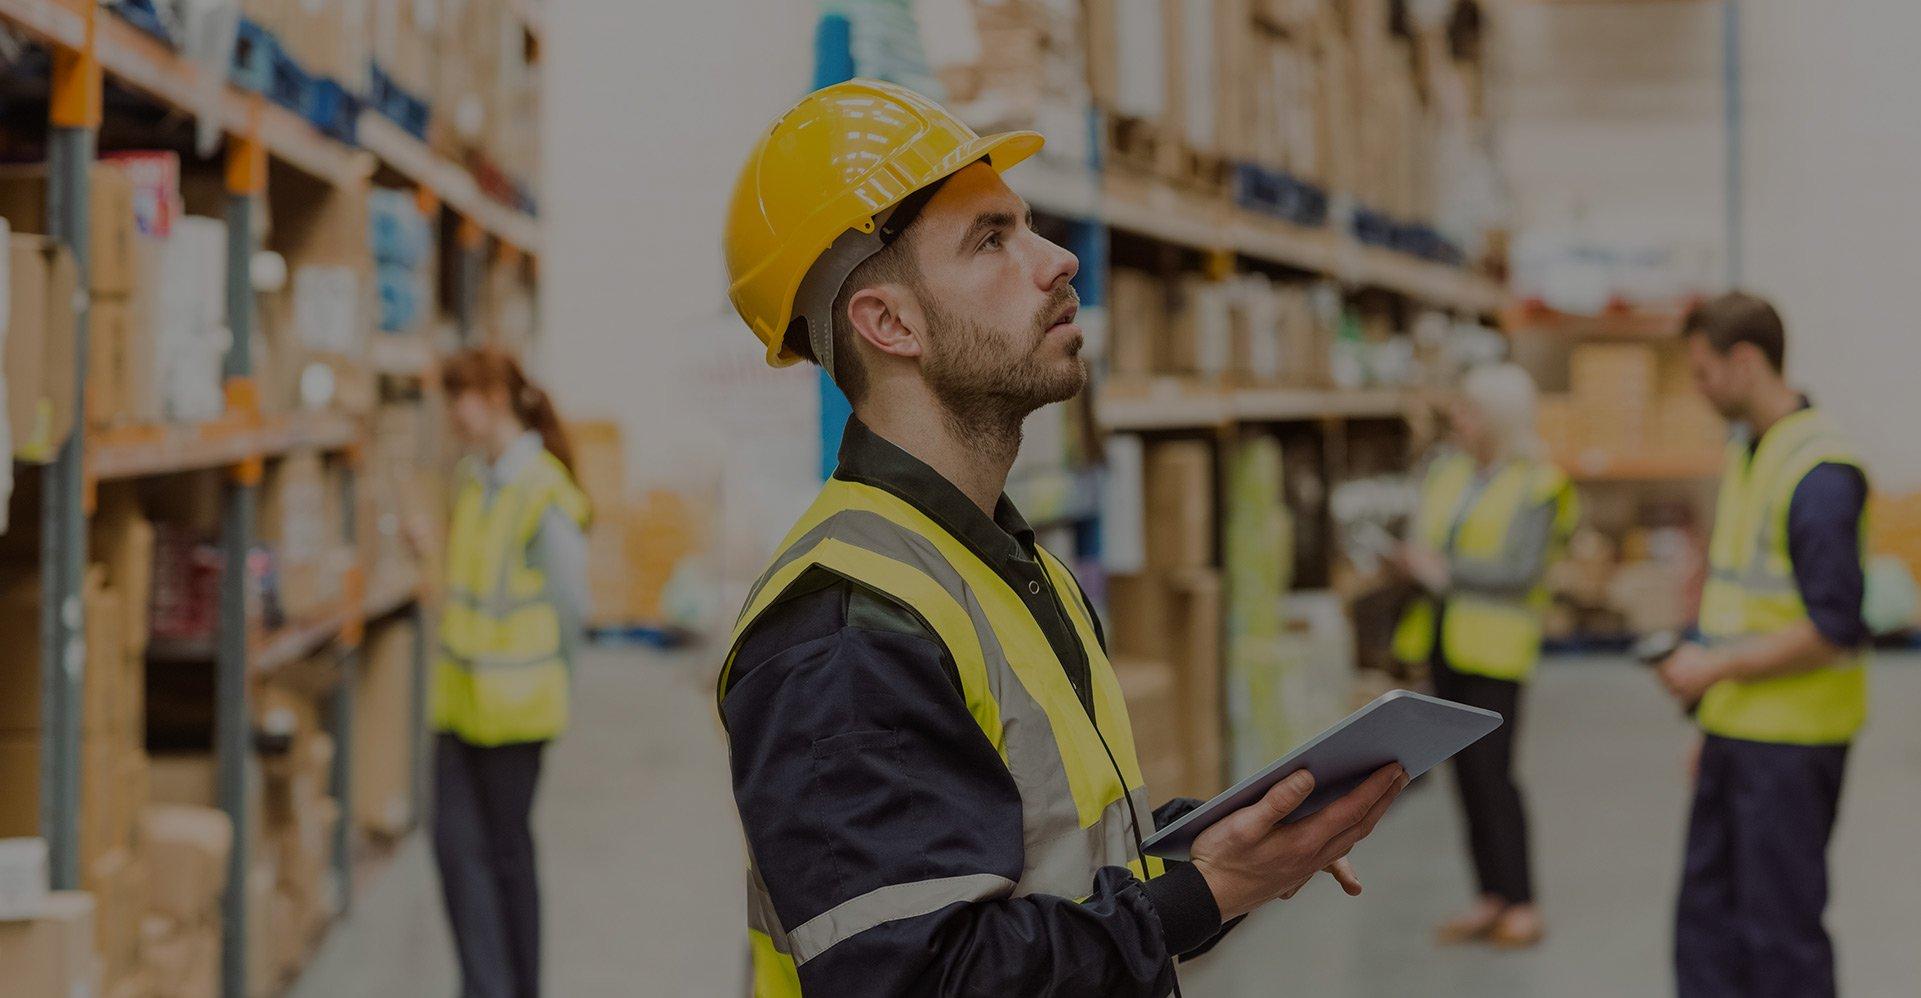 info.vision33.comhubfsalways-on-distribution-warehouse-management-ebook-header-v2